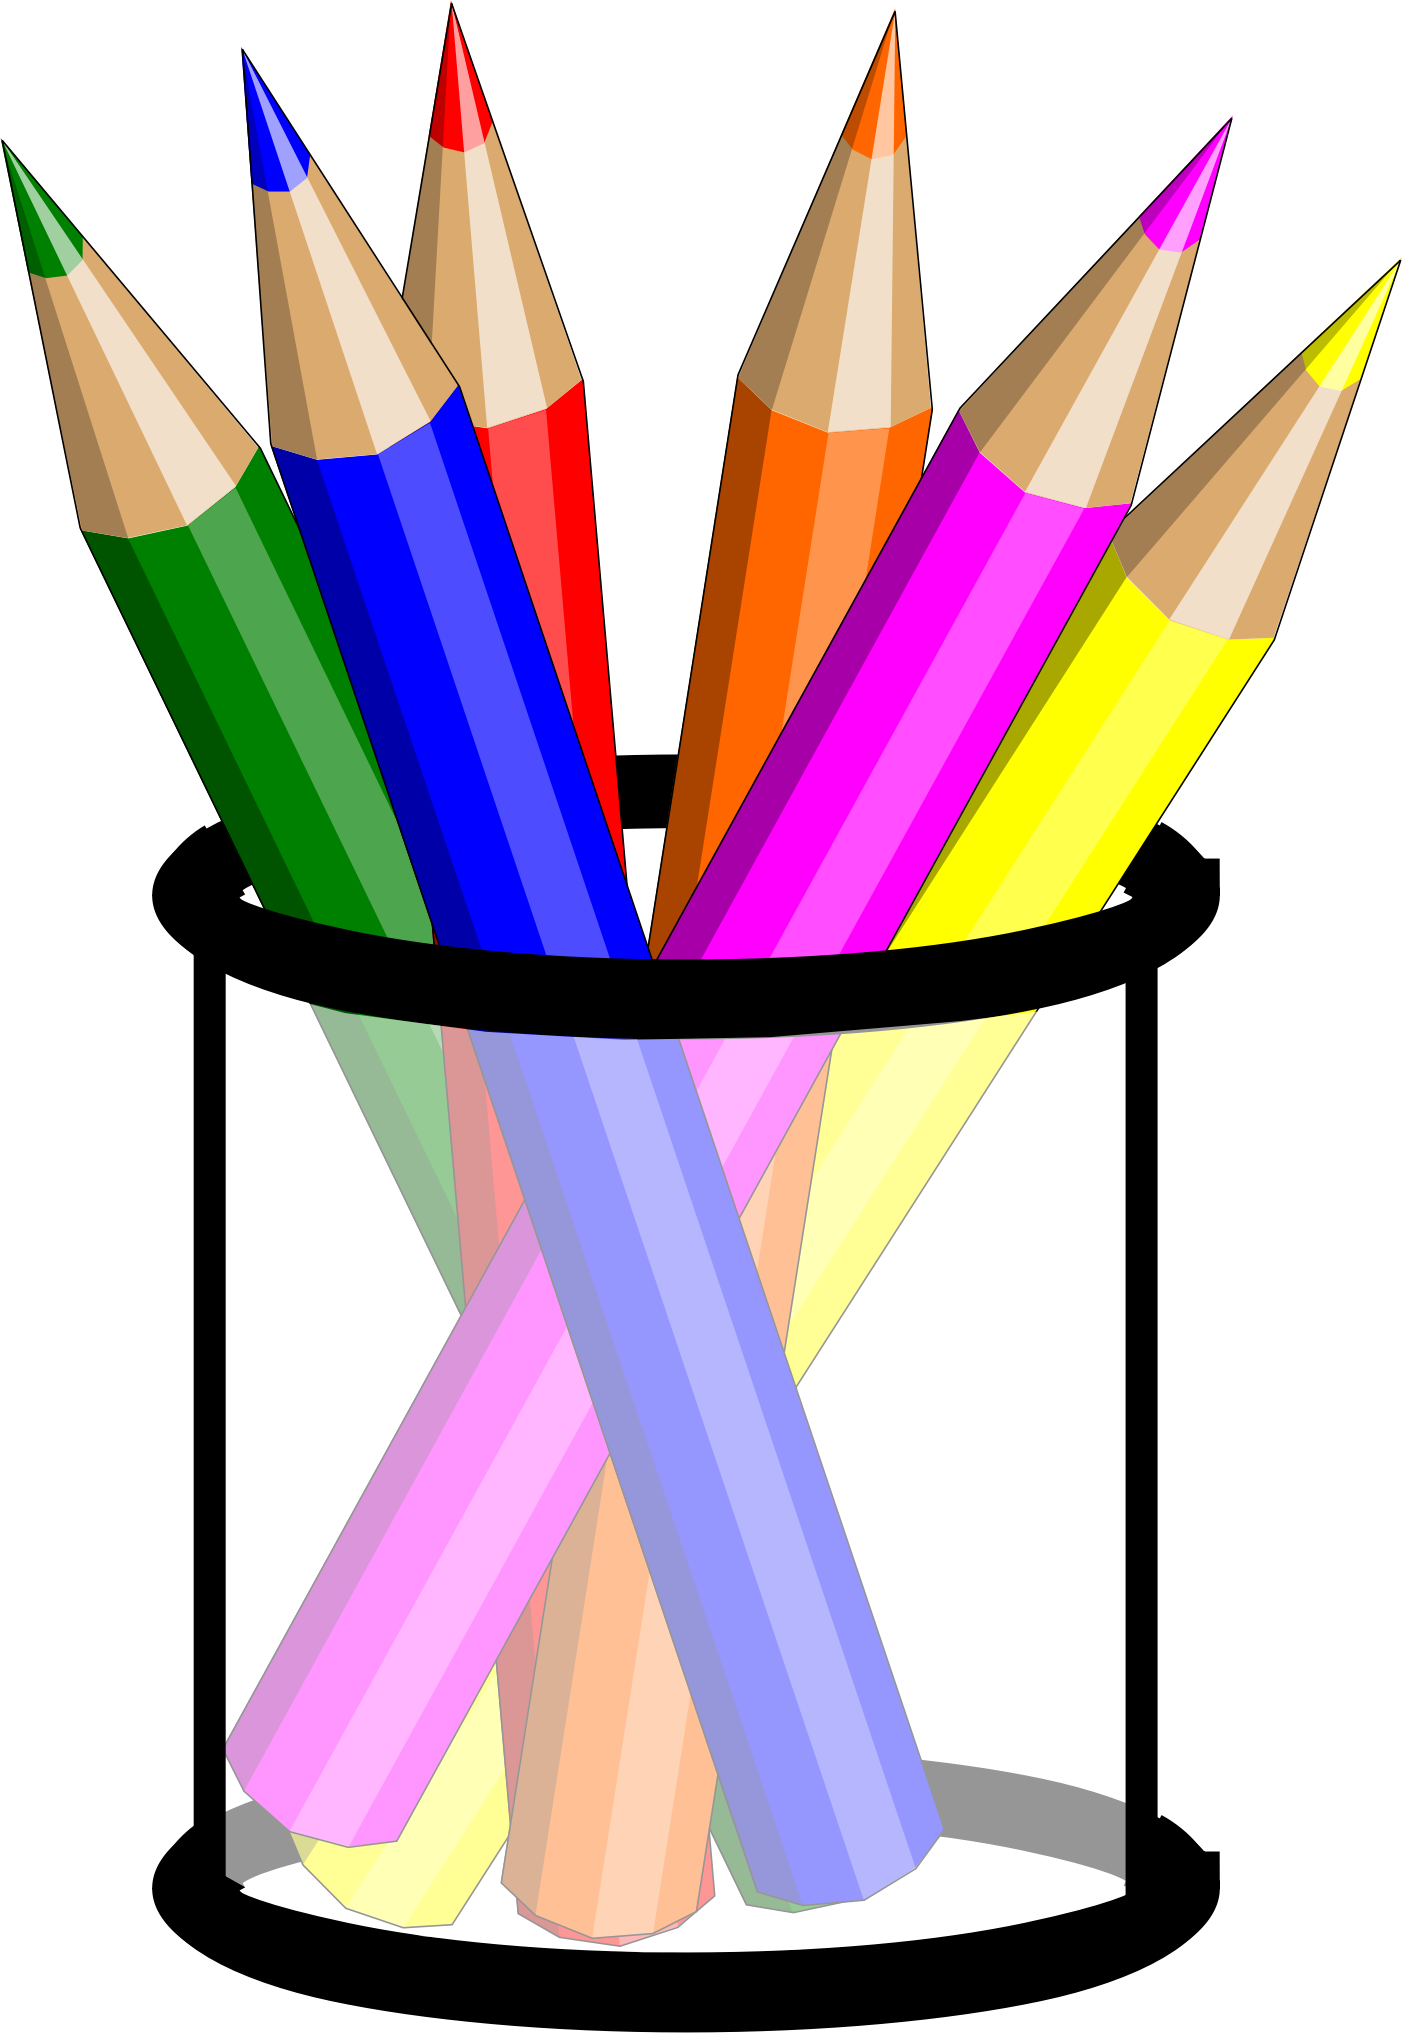 Clipart pen colorful pen, Clipart pen colorful pen.